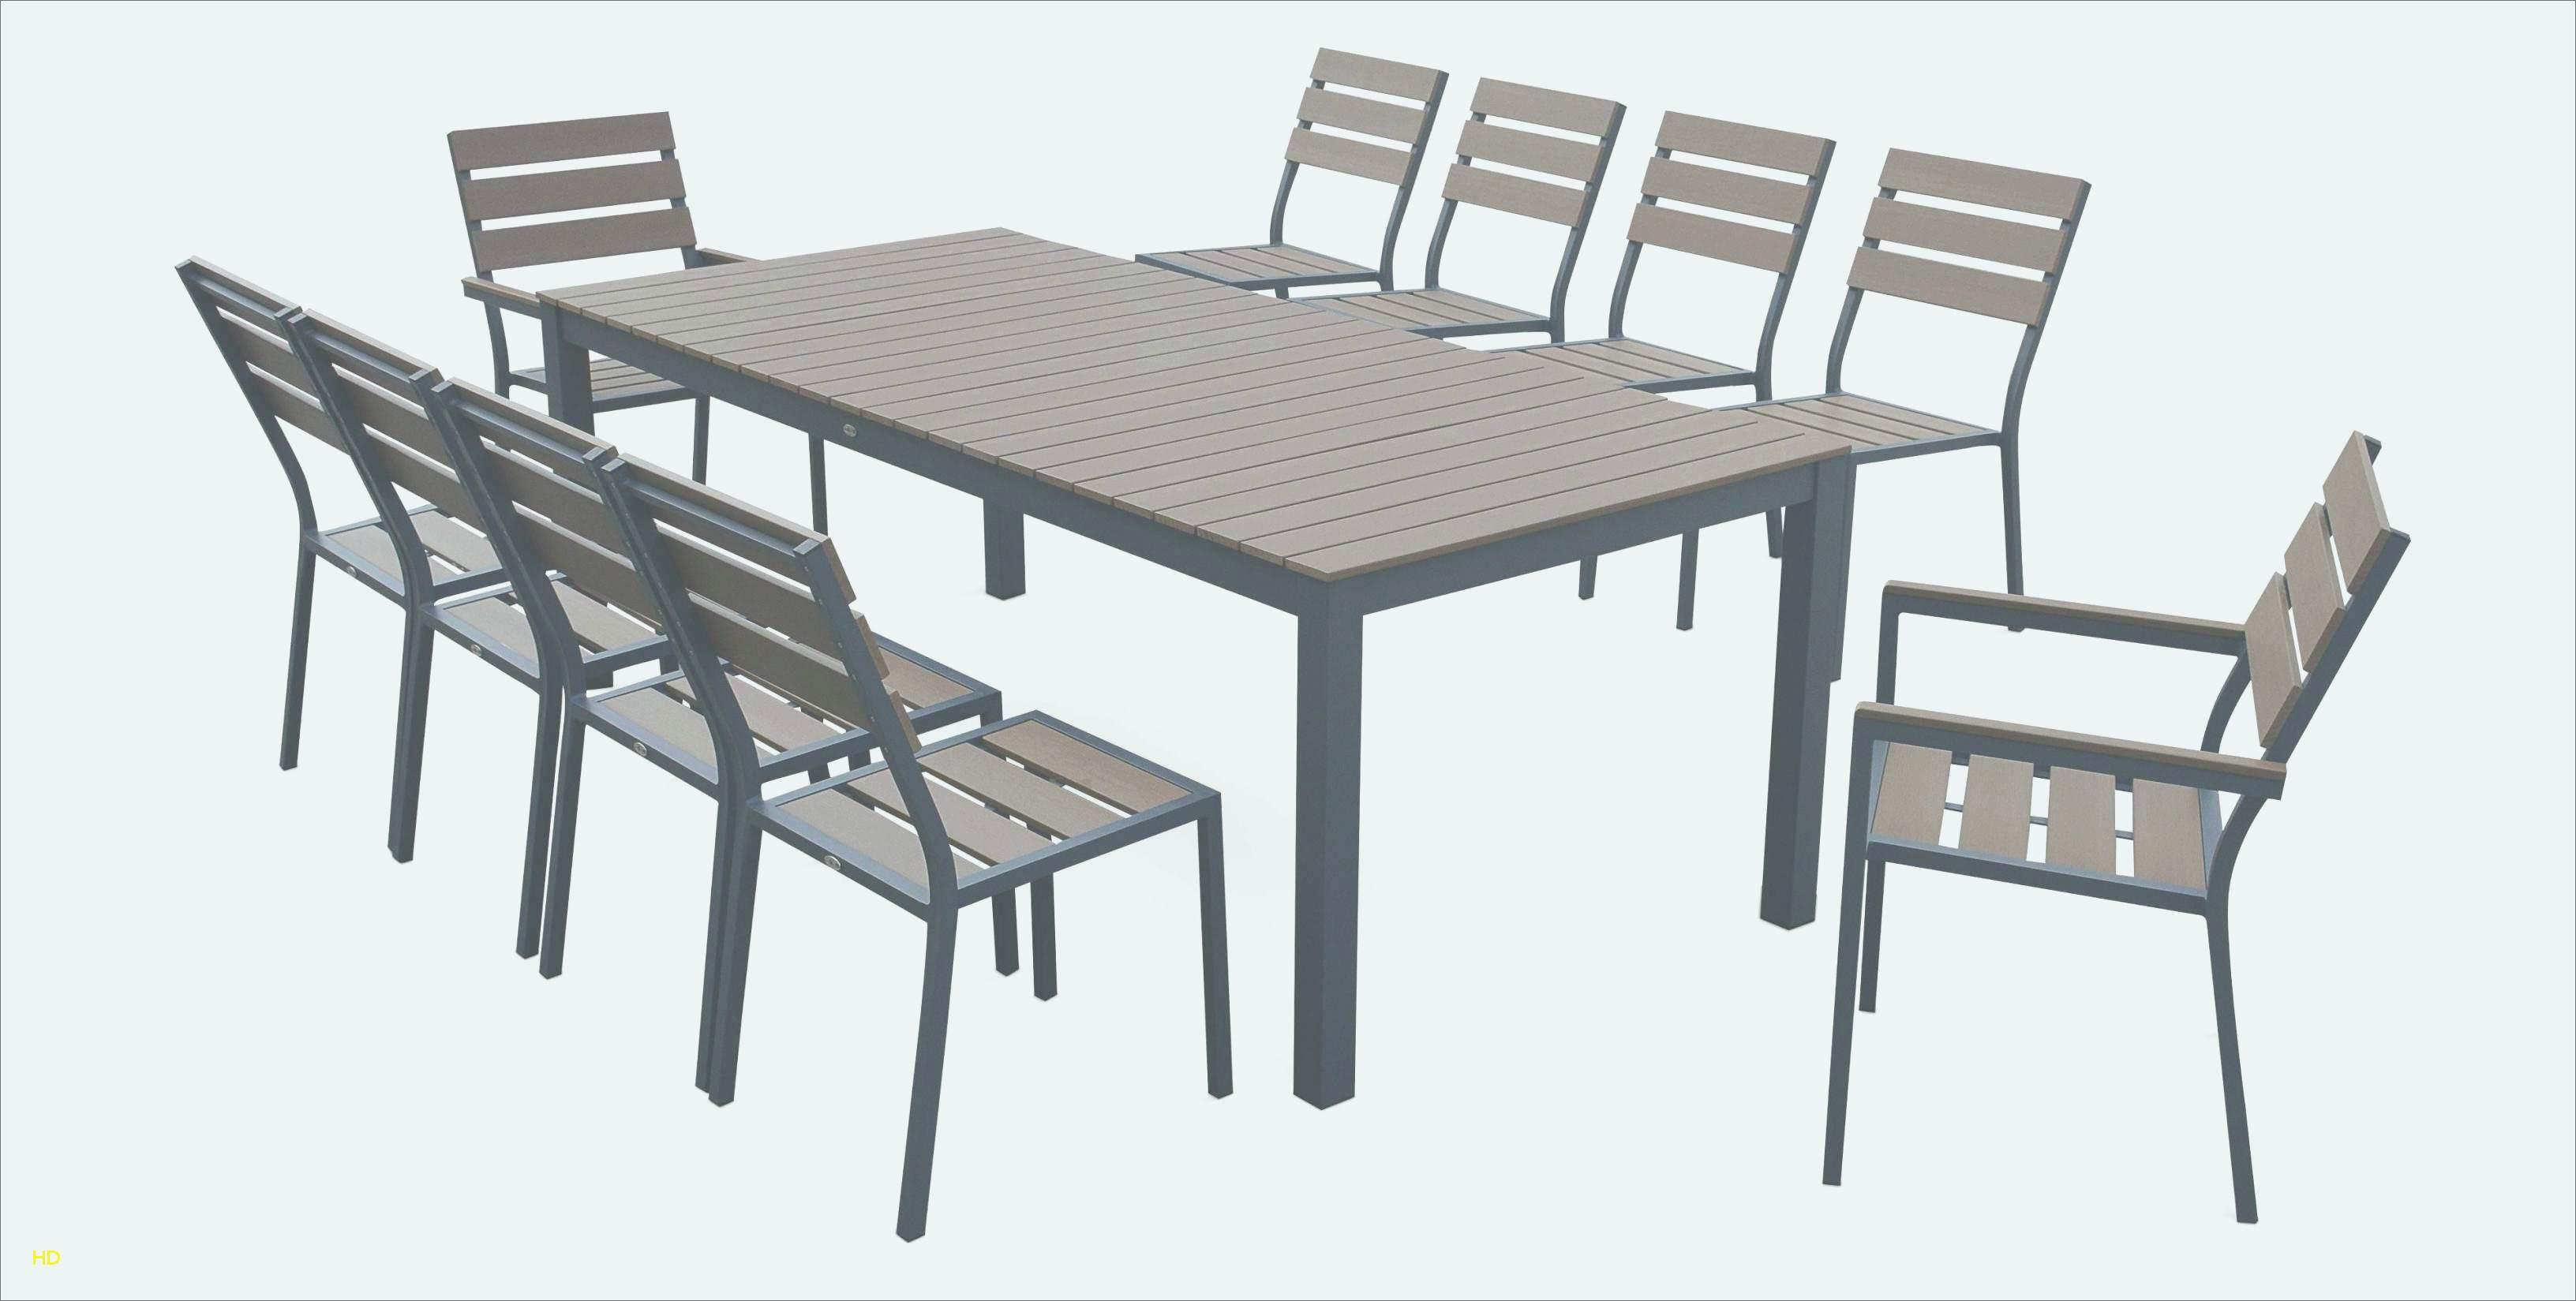 Amazon Banc De Jardin Impressionnant Collection Table De Jardin Amazon Impressionnant Nouveau Table De Jardin Avec